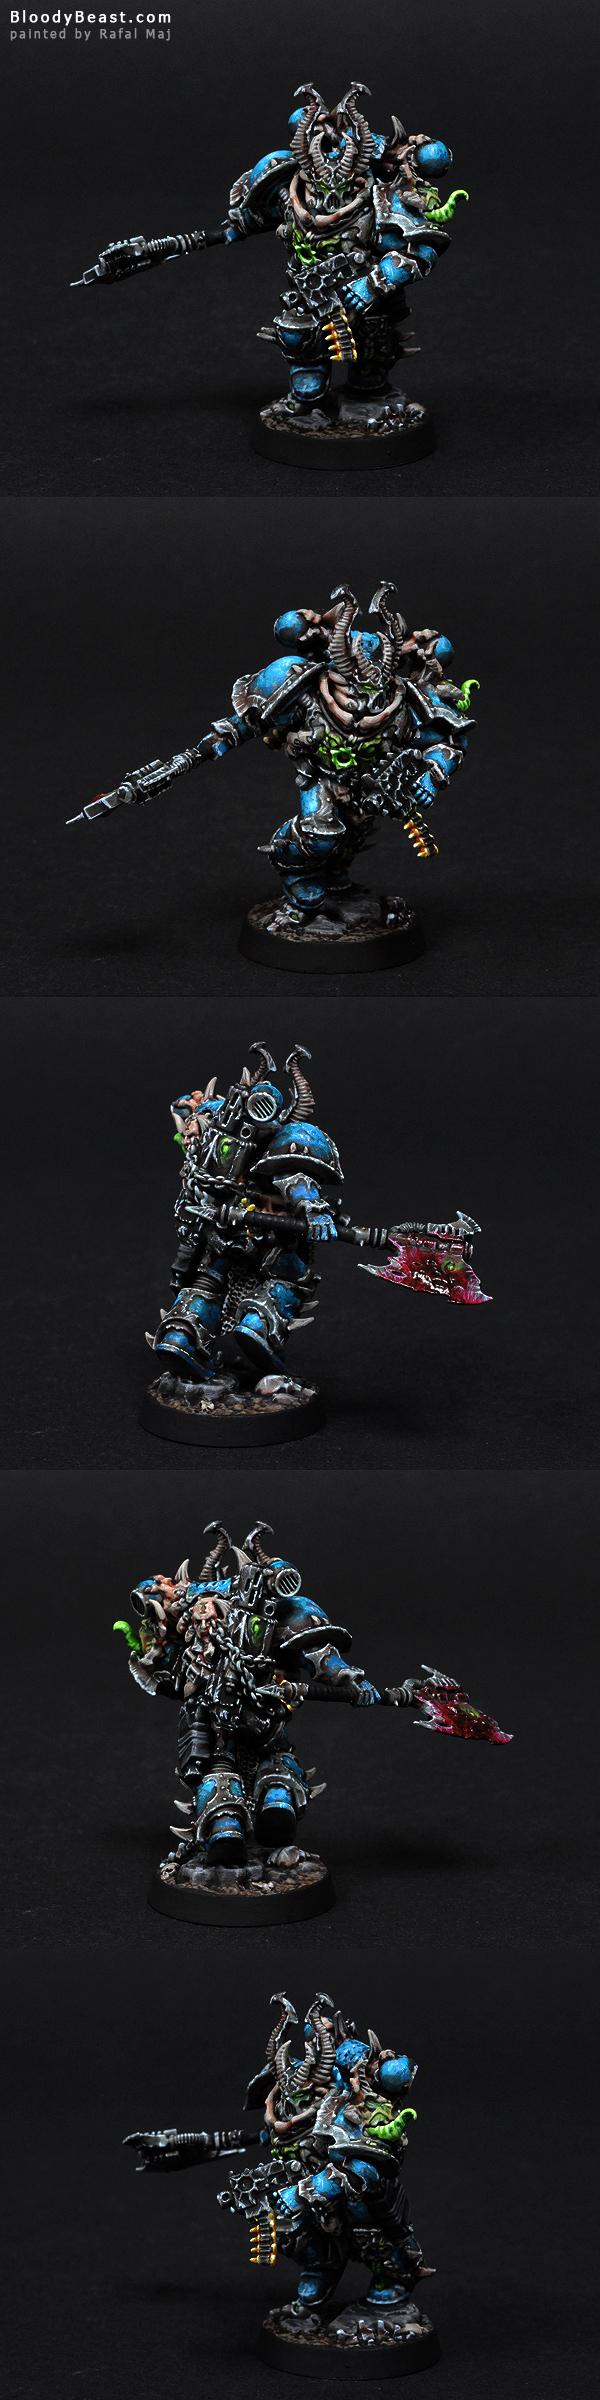 Alpha Legion Champion painted by Rafal Maj (BloodyBeast.com)